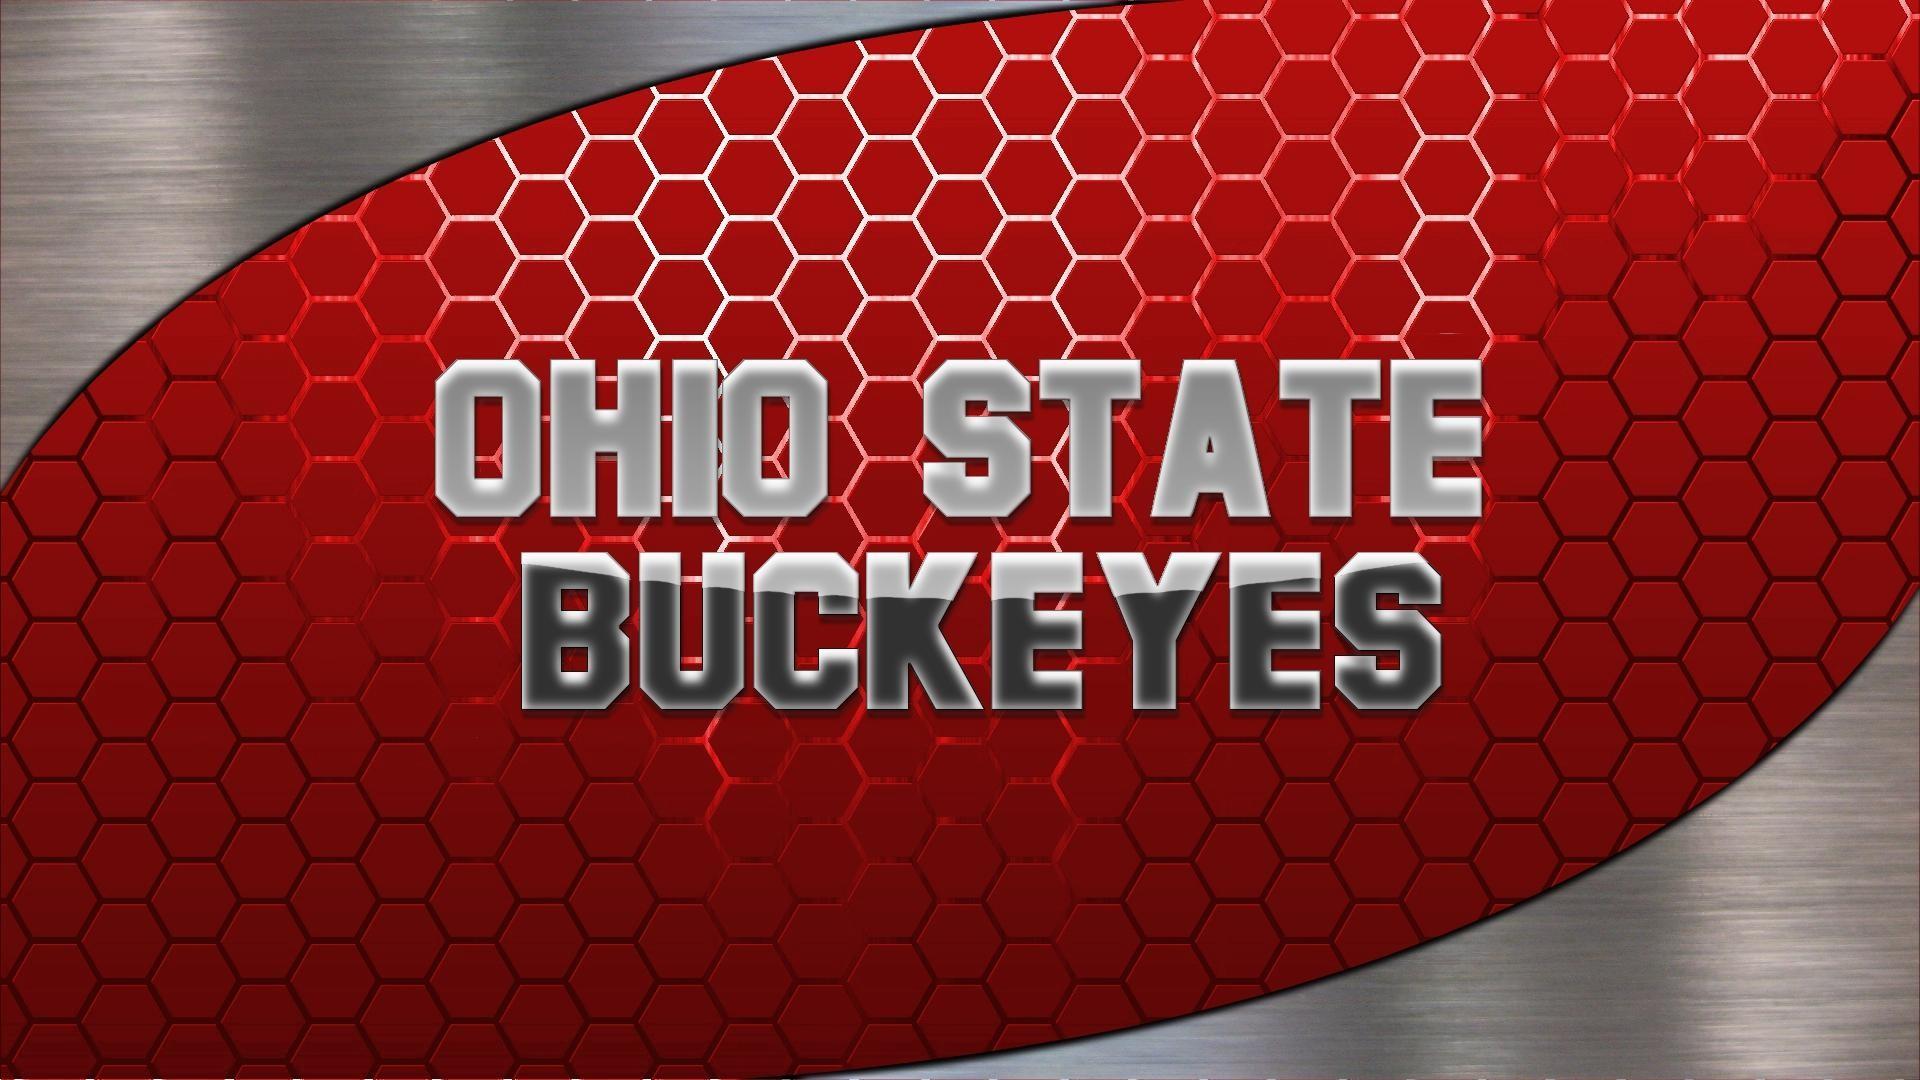 OSU-Wallpaper-ohio-state-football-photo